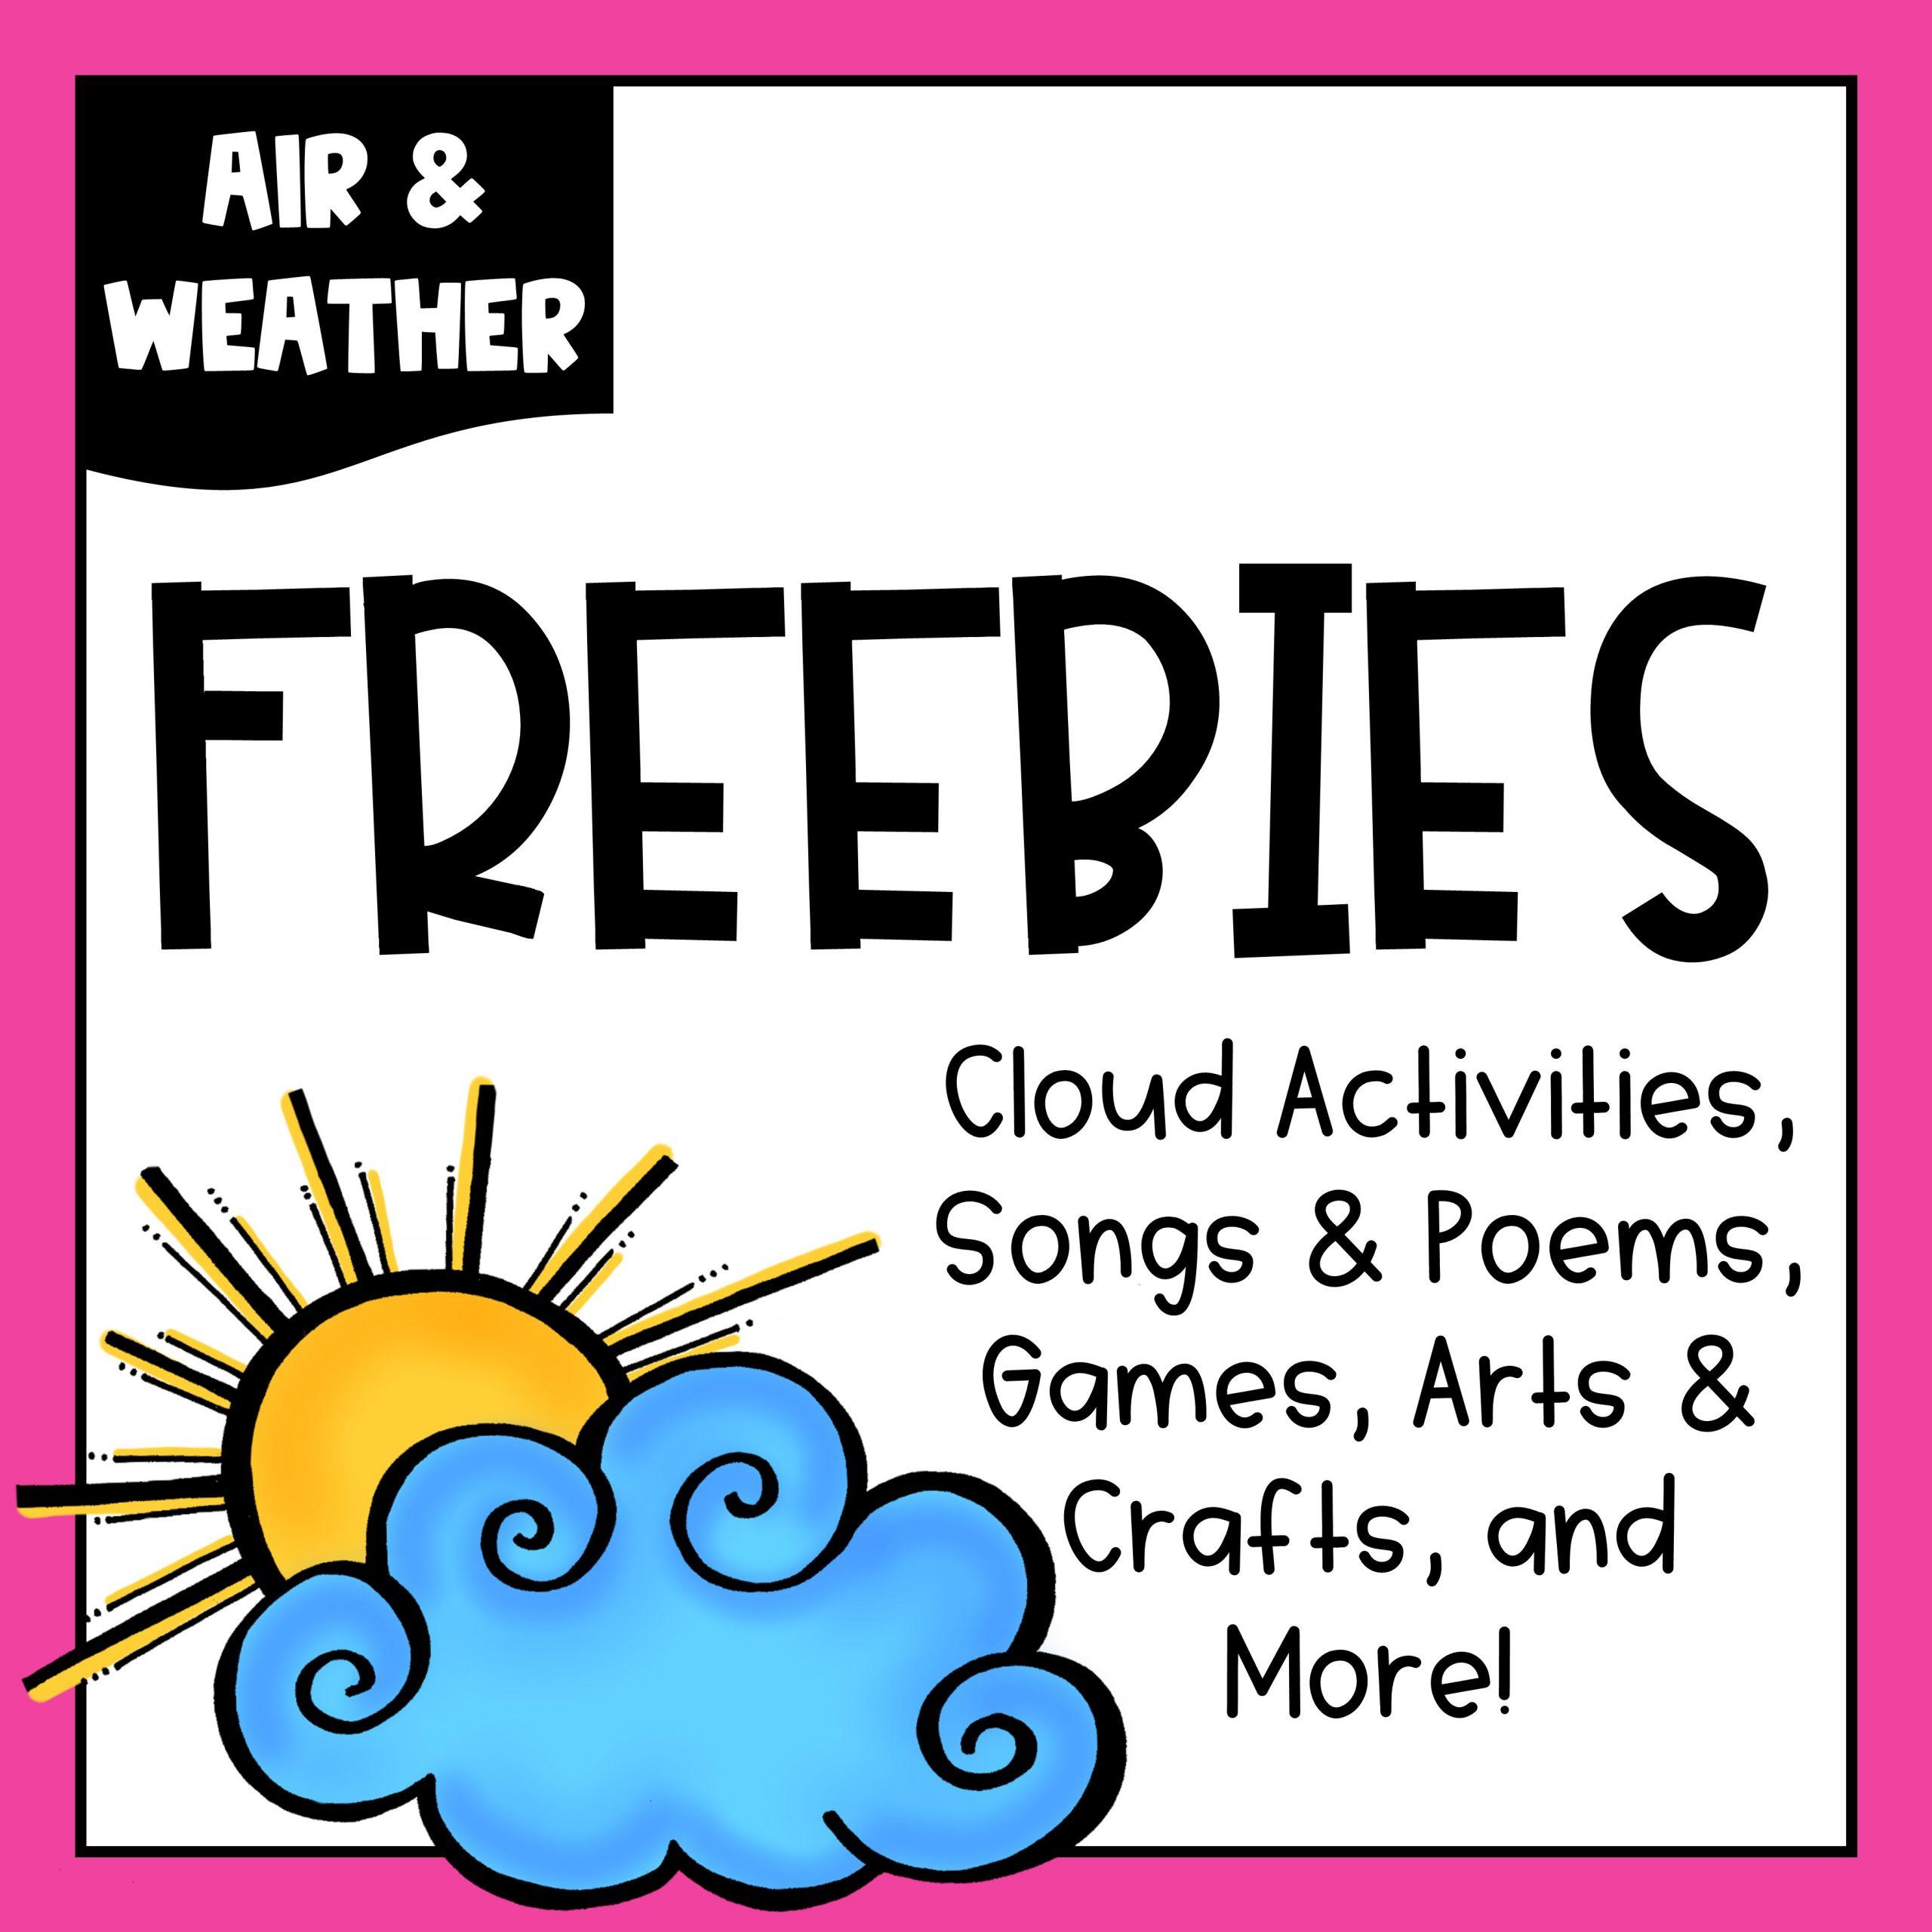 hight resolution of Air \u0026 Weather Freebies